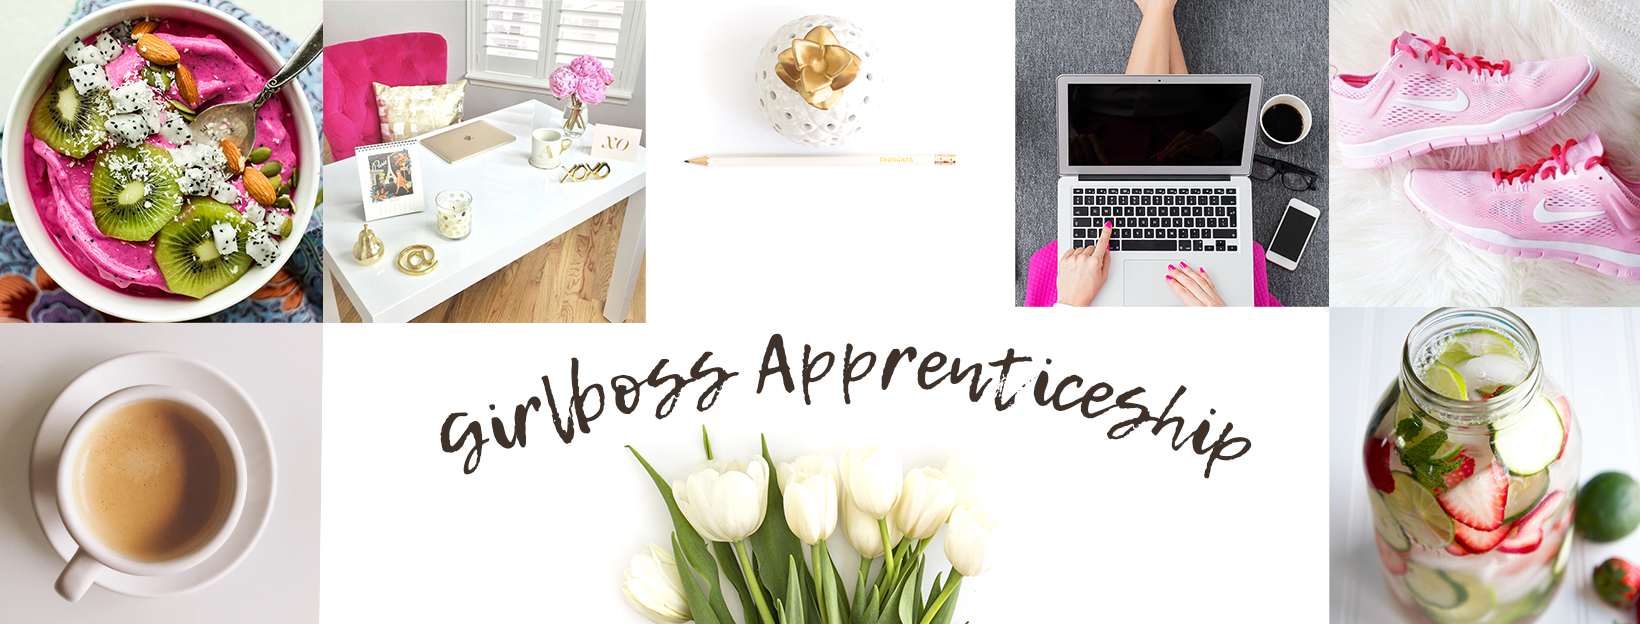 girlboss-apprenticeship-holly-ashly-v2.jpg